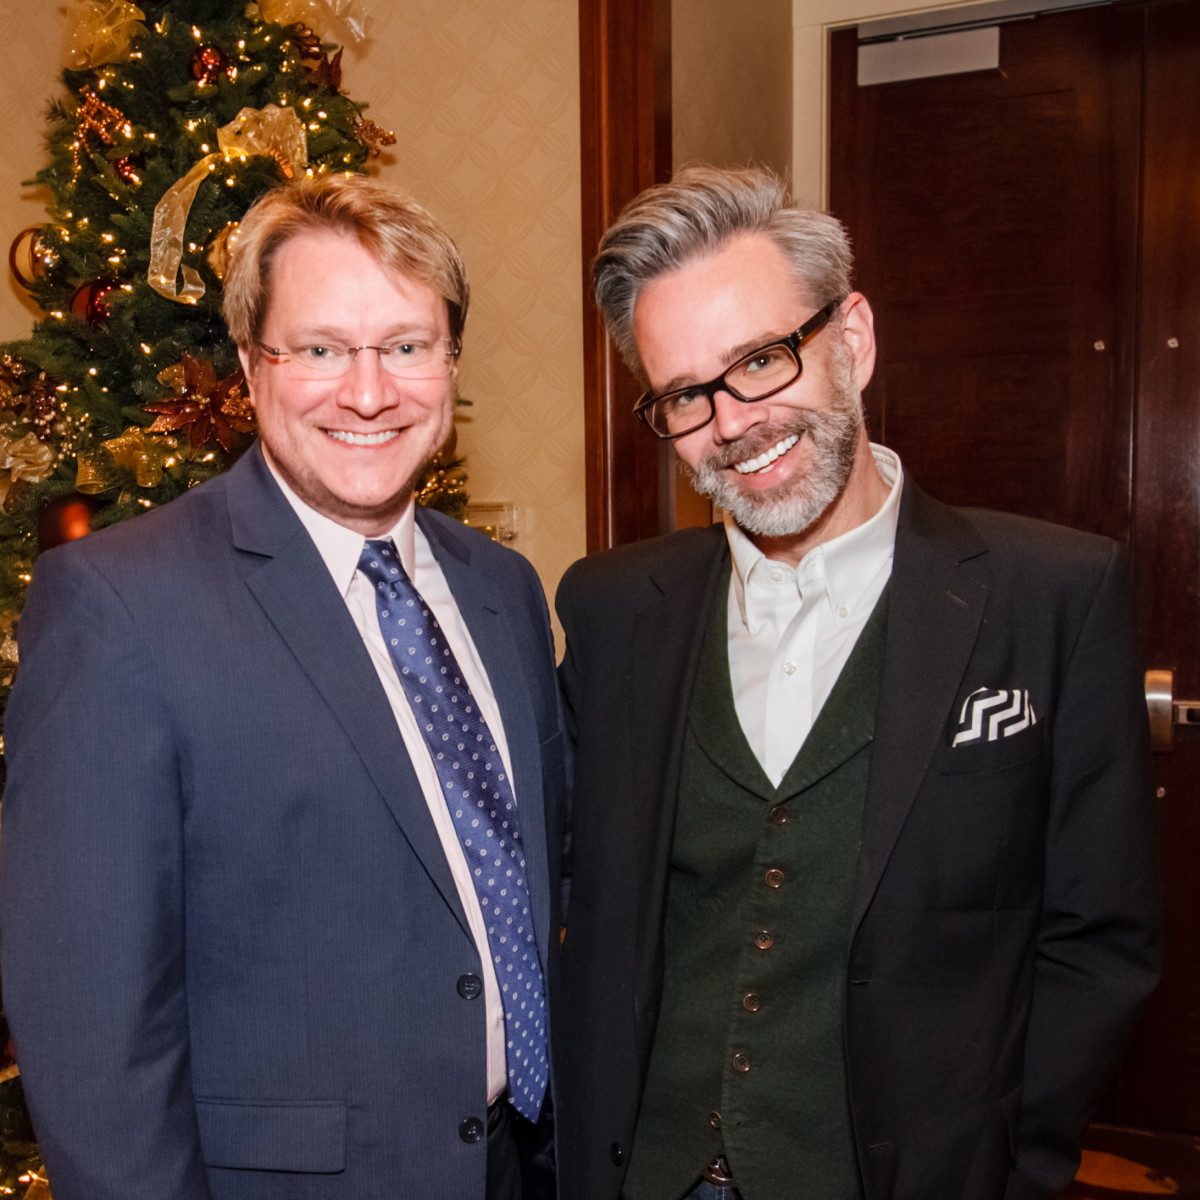 World AIDS Day luncheon Matt Burrus, Michael Pearce